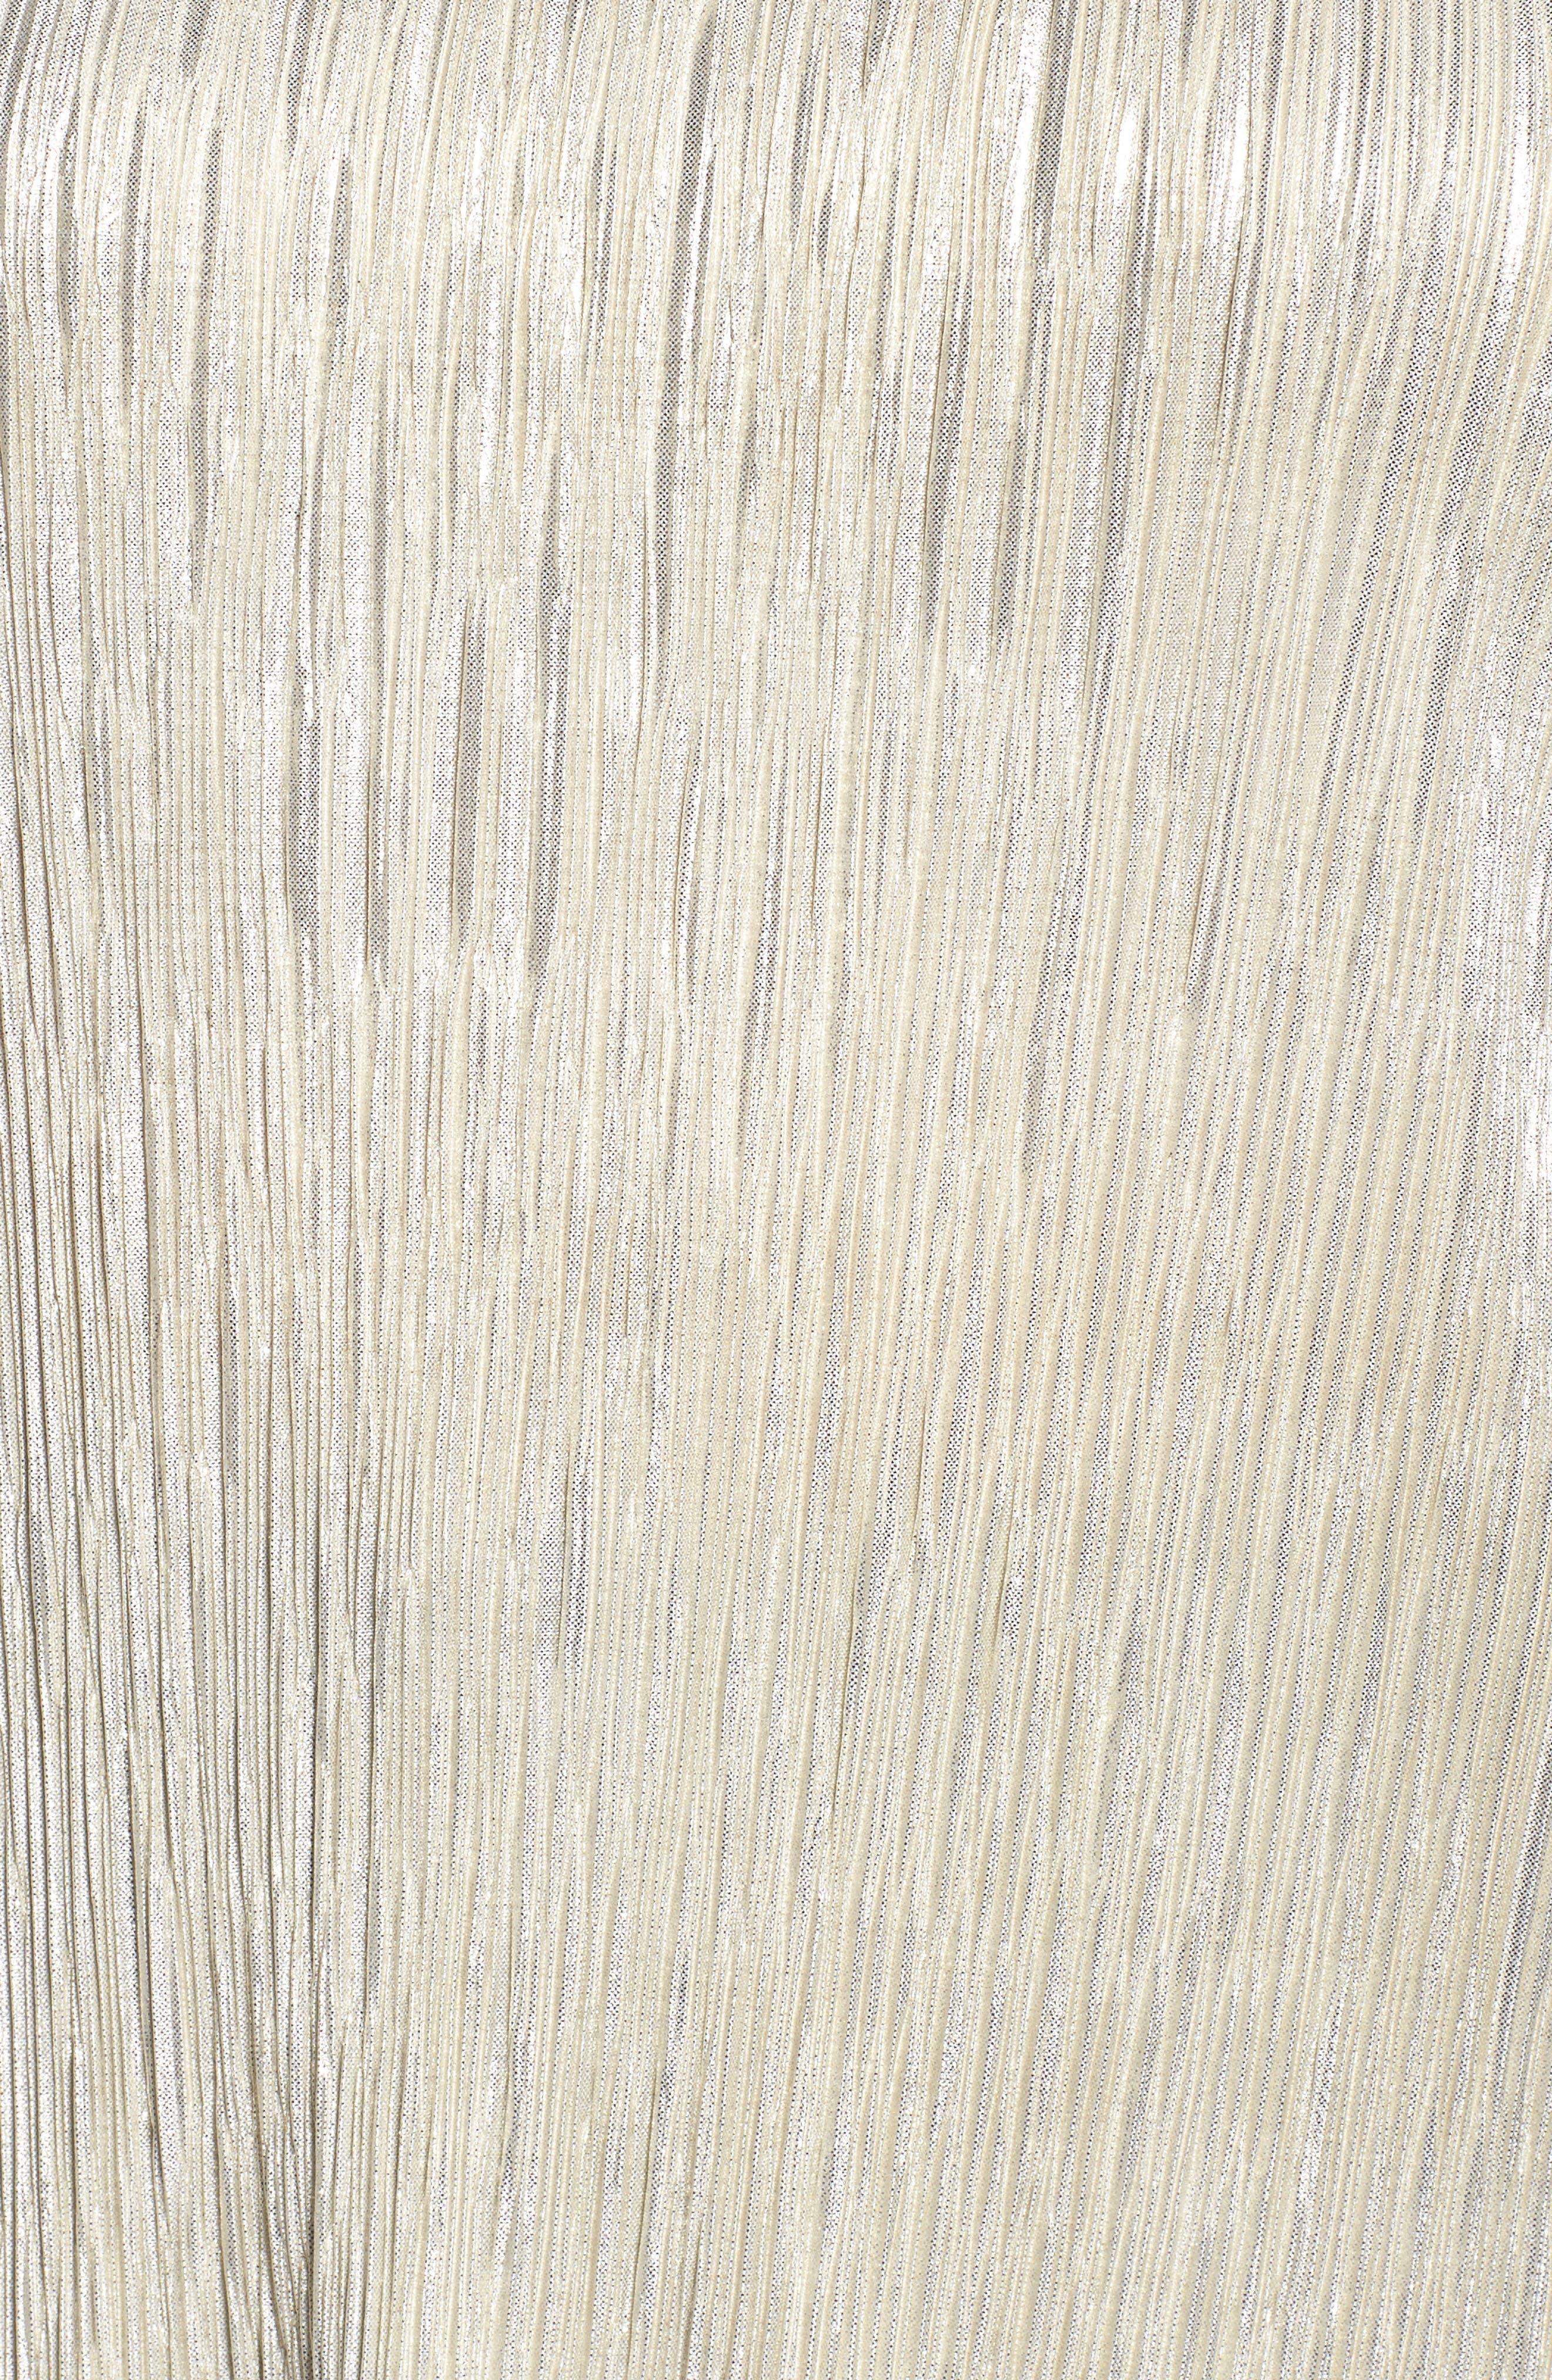 Alternate Image 5  - Dantelle Ribbed Foil Top (Plus Size)